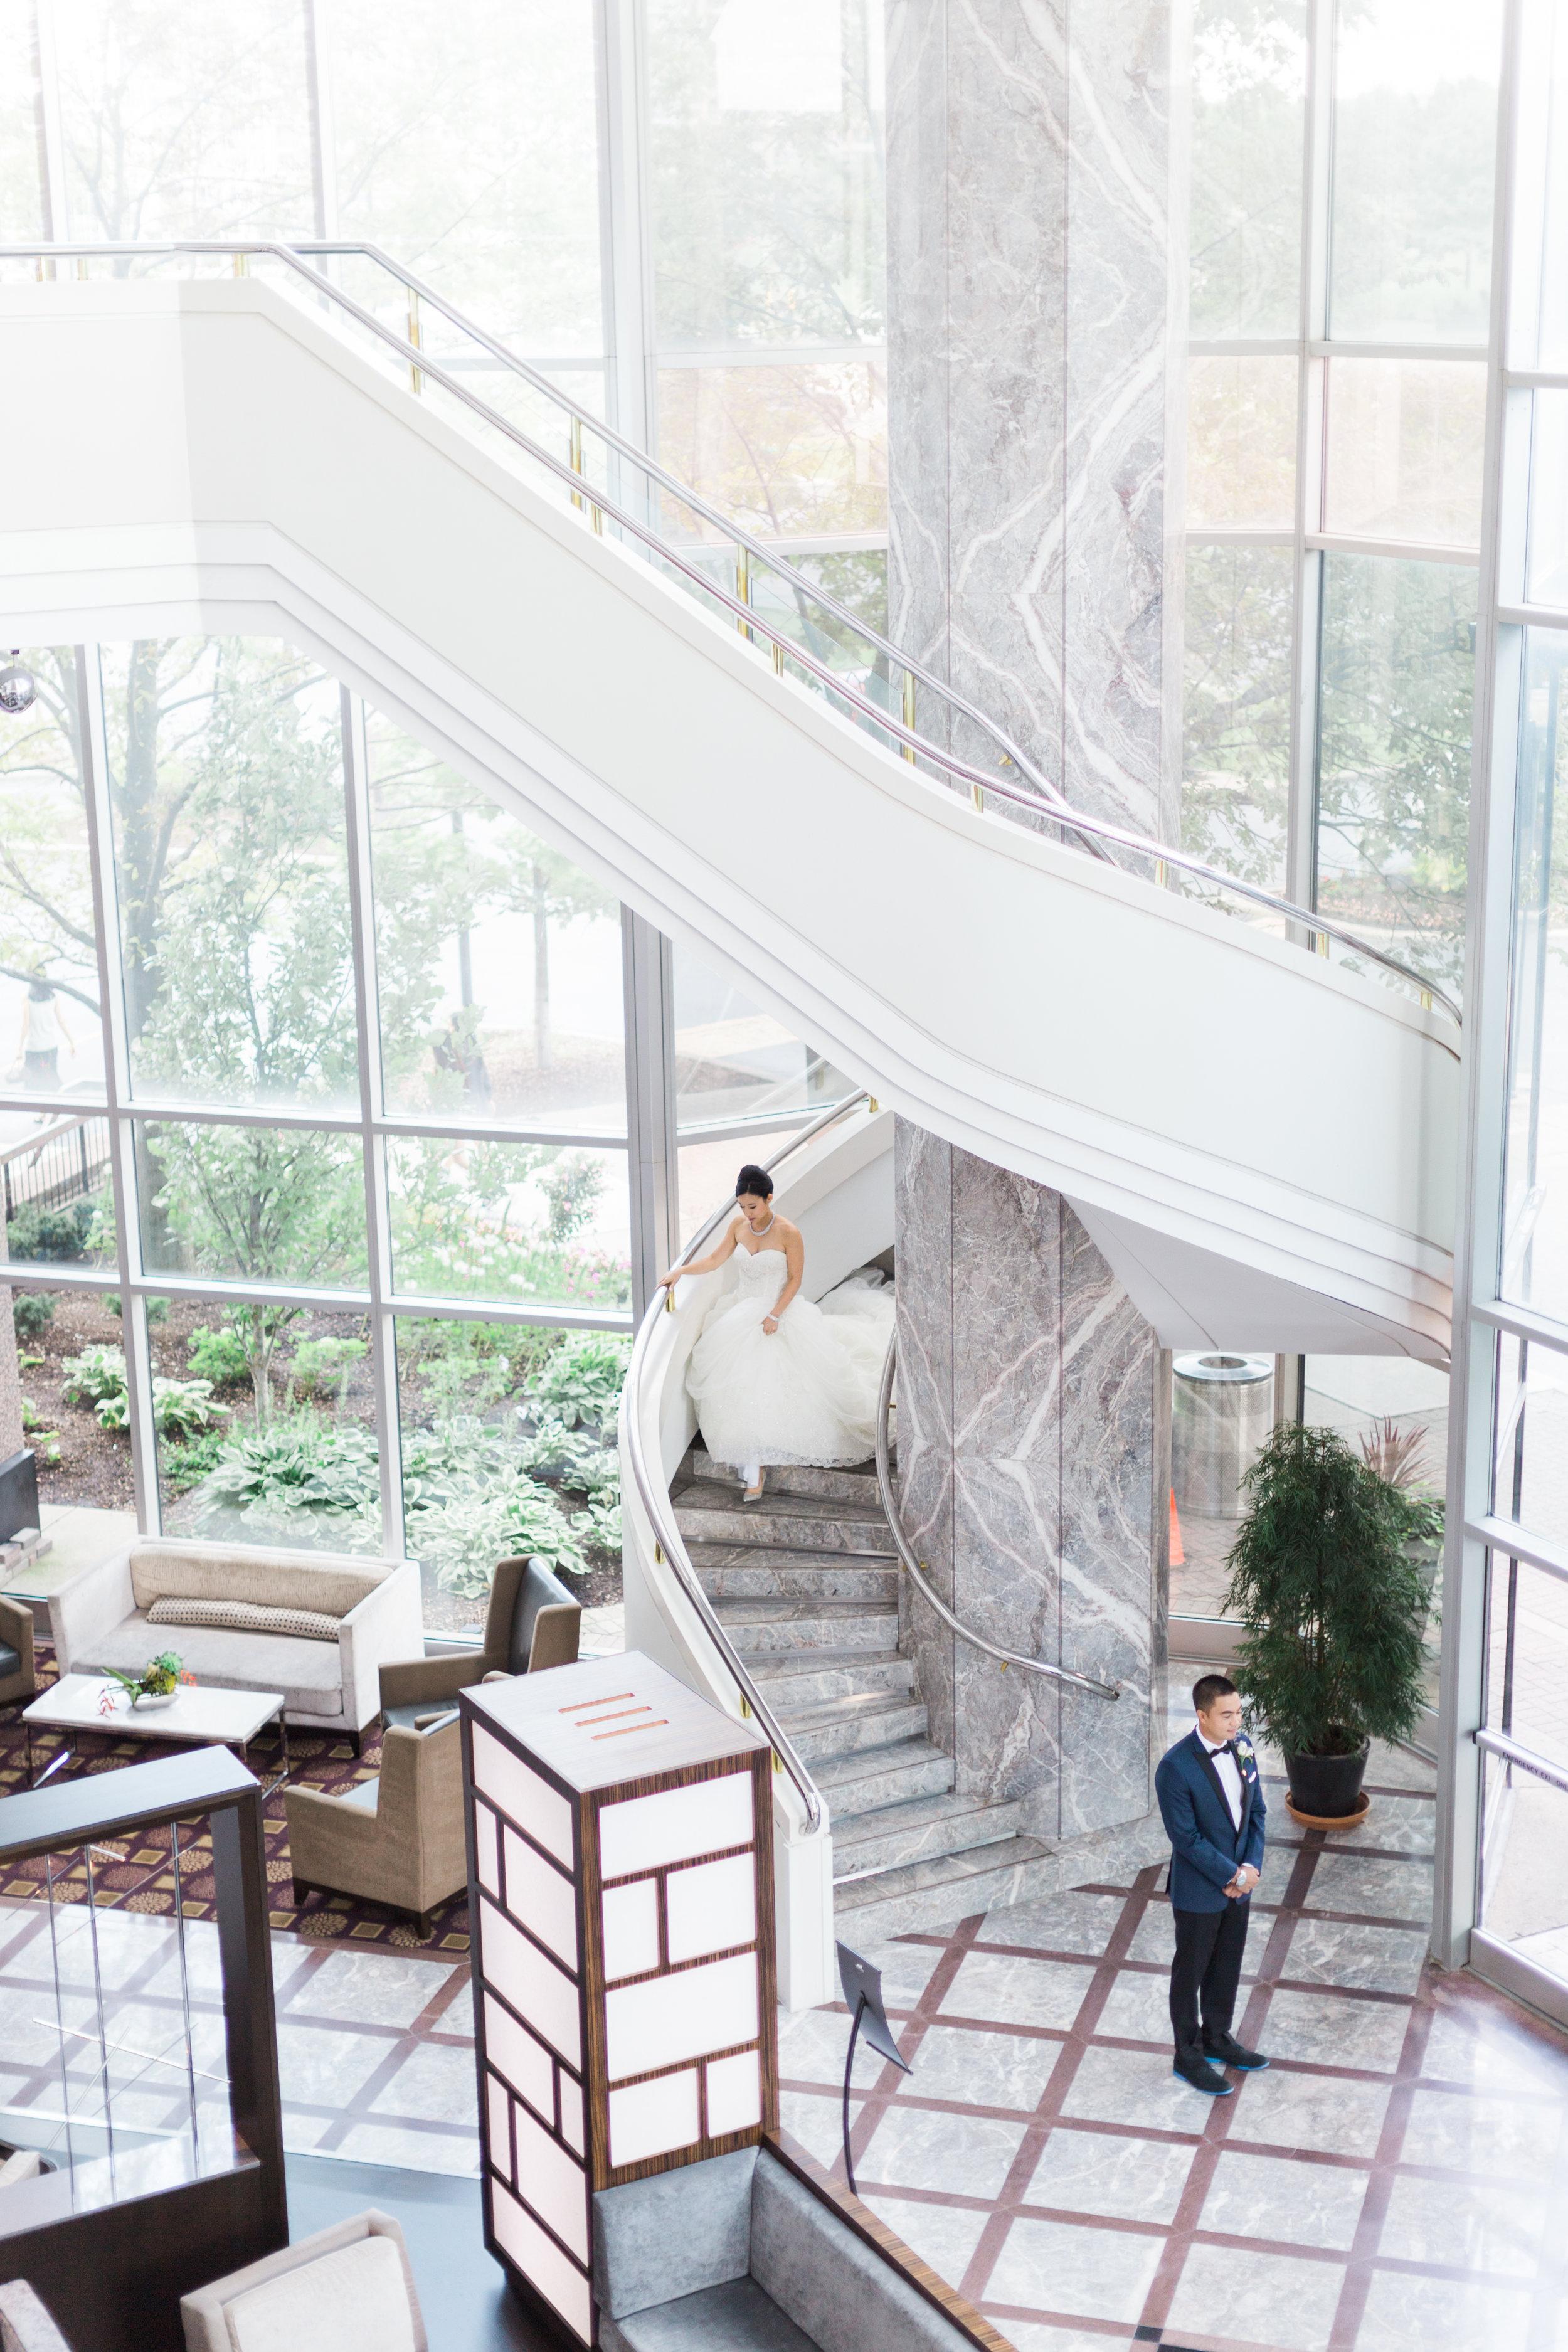 Toronto Fine Art Photographer - Hilton Markham Wedding - First Look-5.jpg